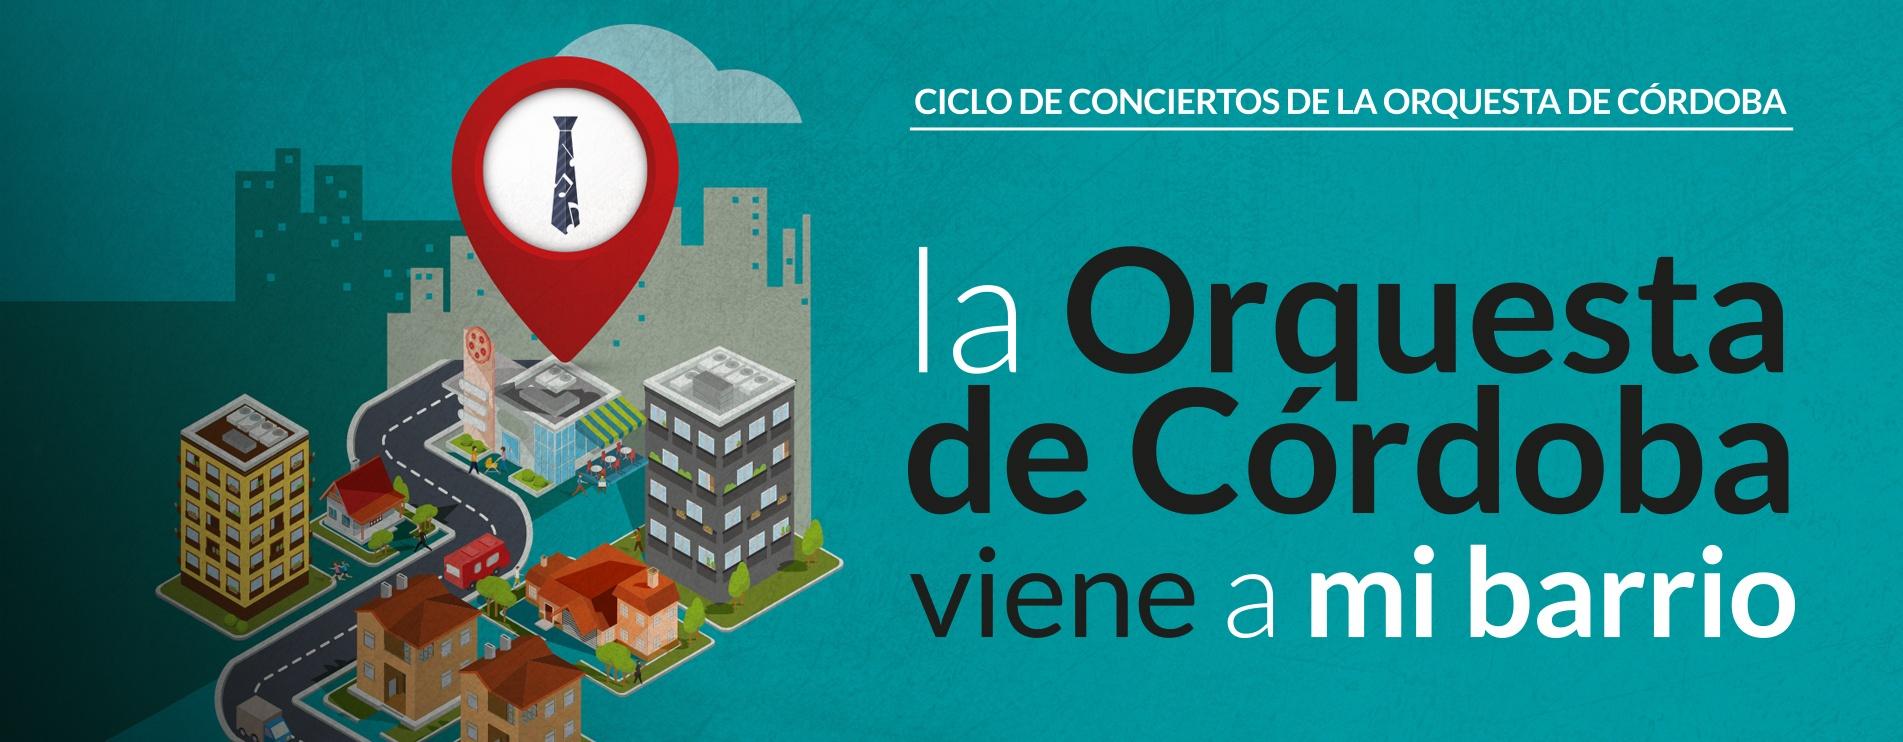 La Orquesta viene a mi barrio (Villarrubia)